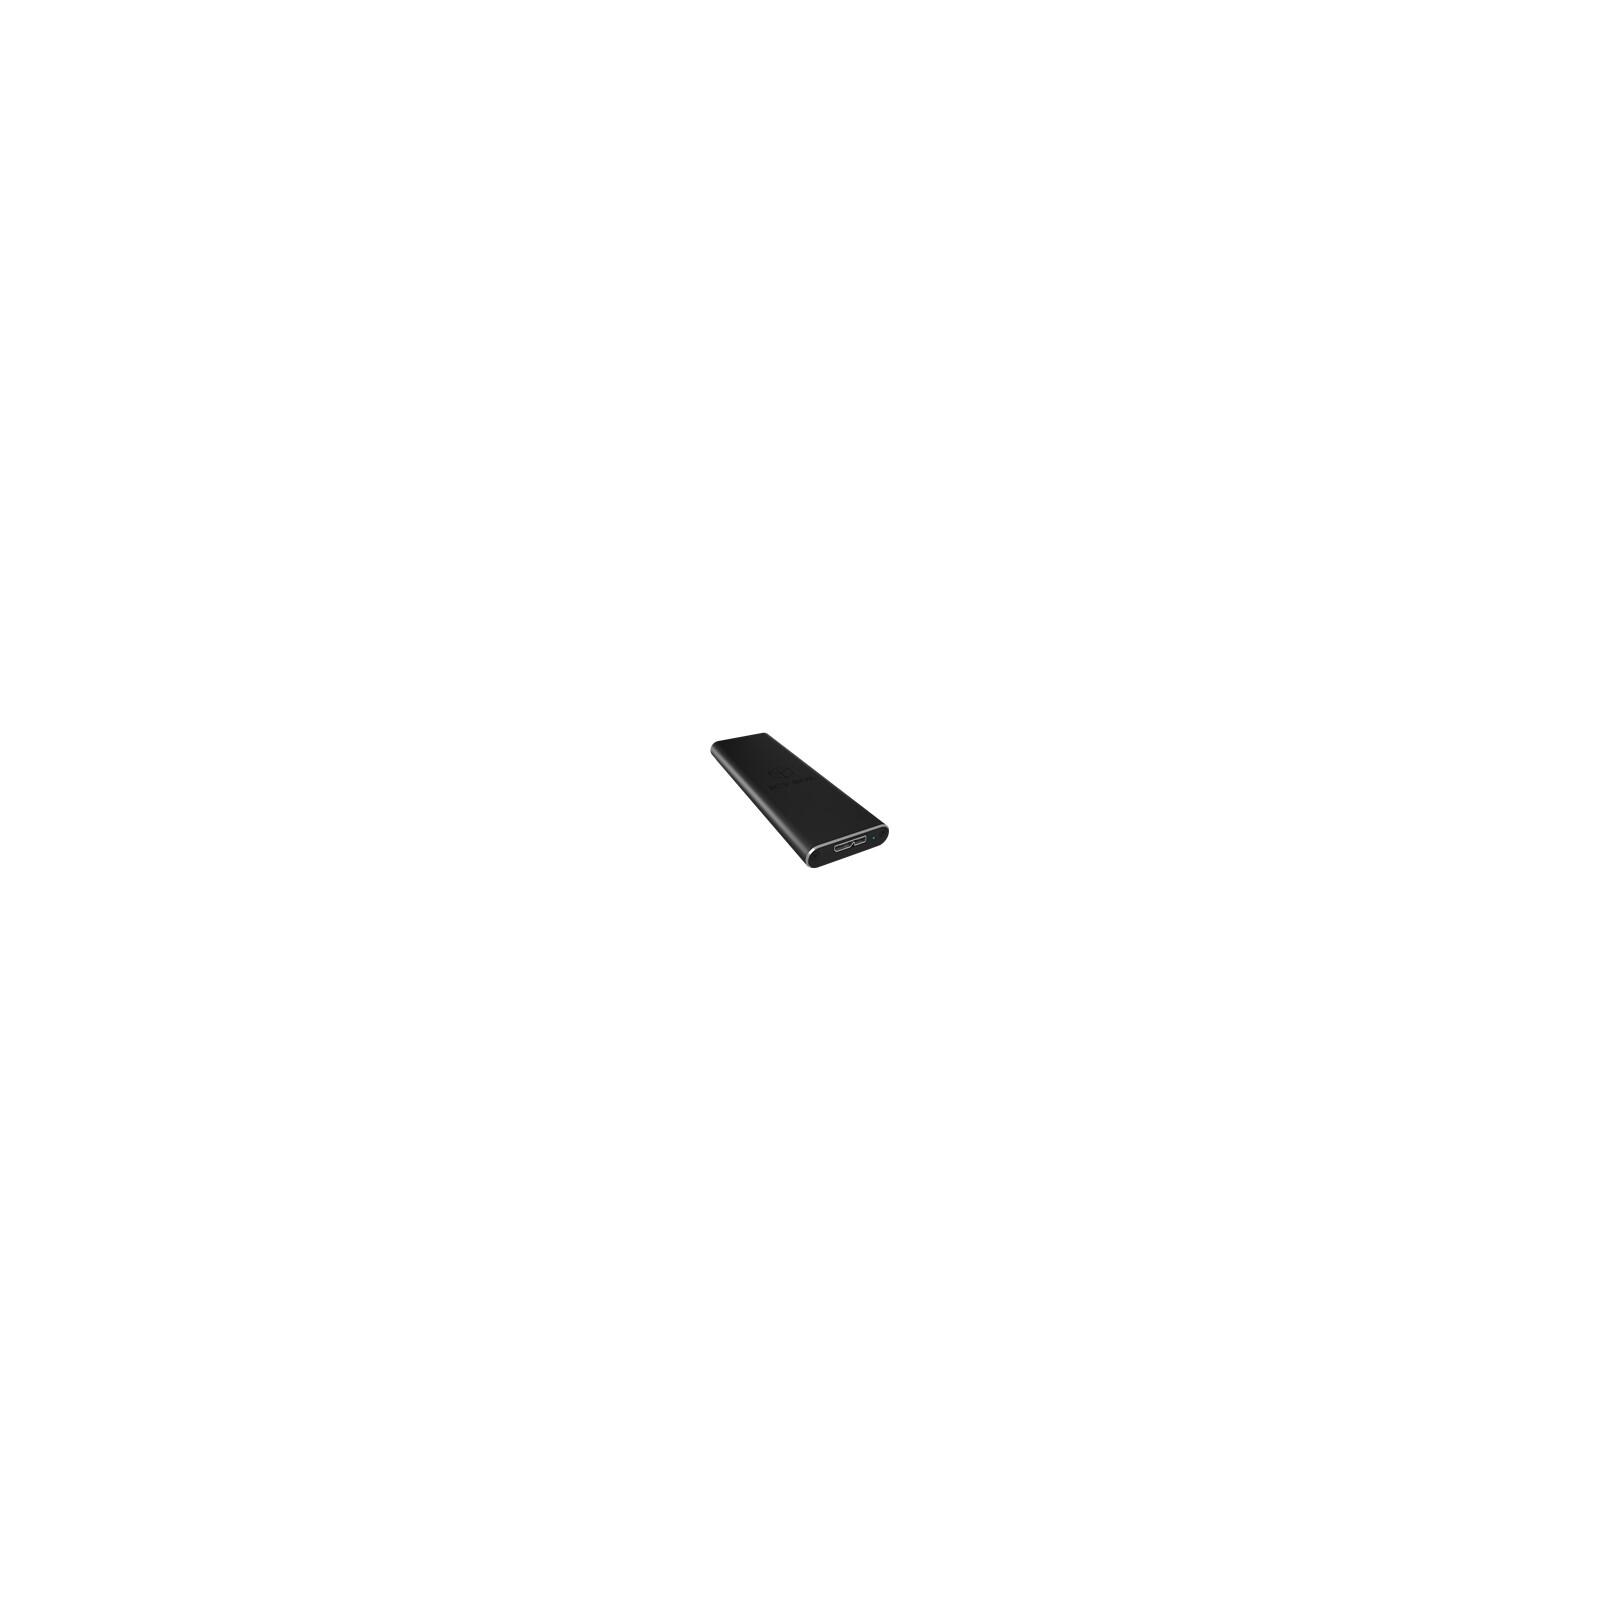 ICY BOX IB-183M2 Externes USB 3.0 Gehäuse schwarz